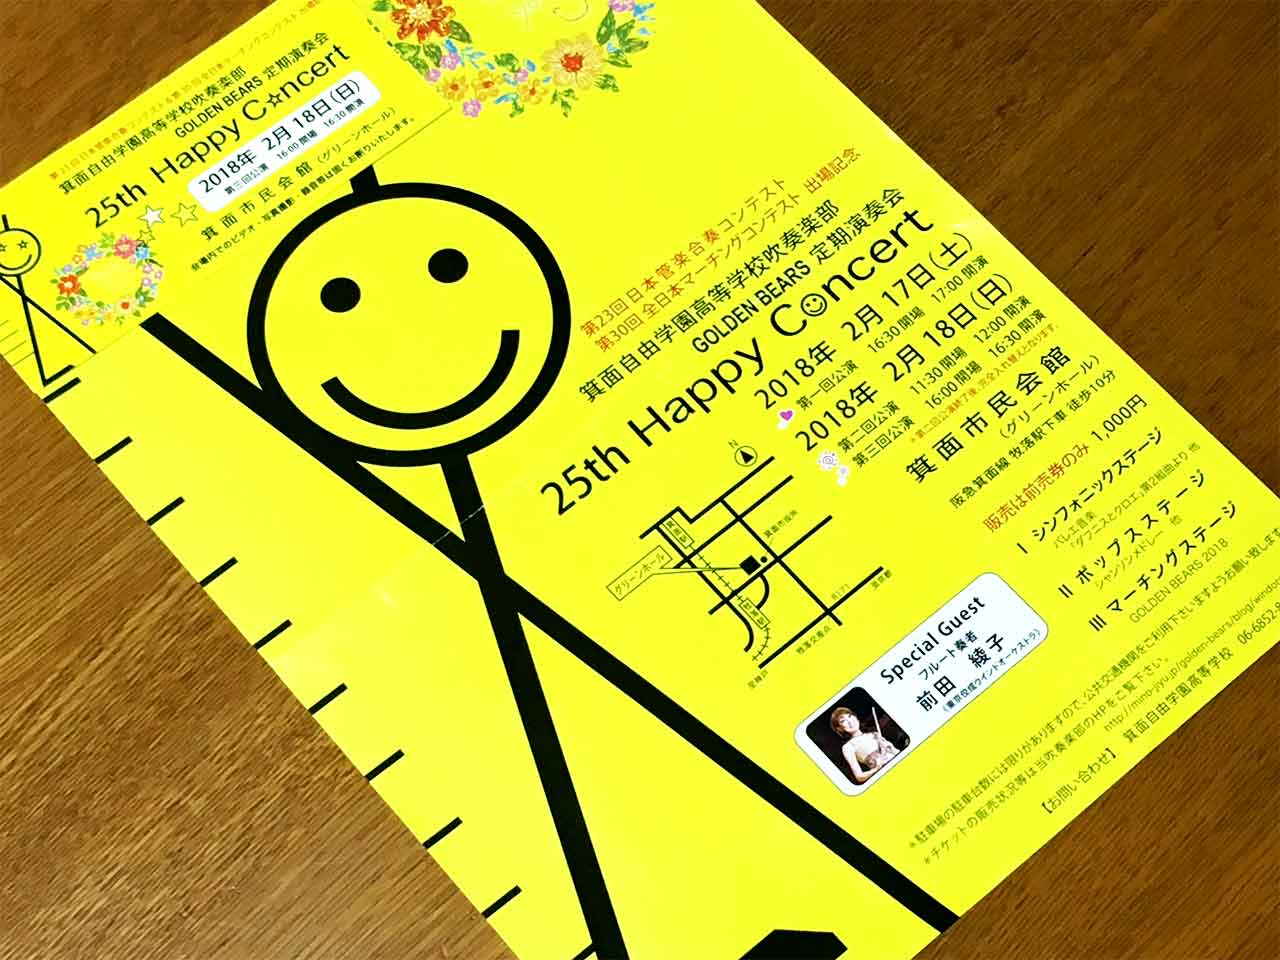 箕面自由学園高校吹奏楽部定期演奏会第25回ハッピーコンサート